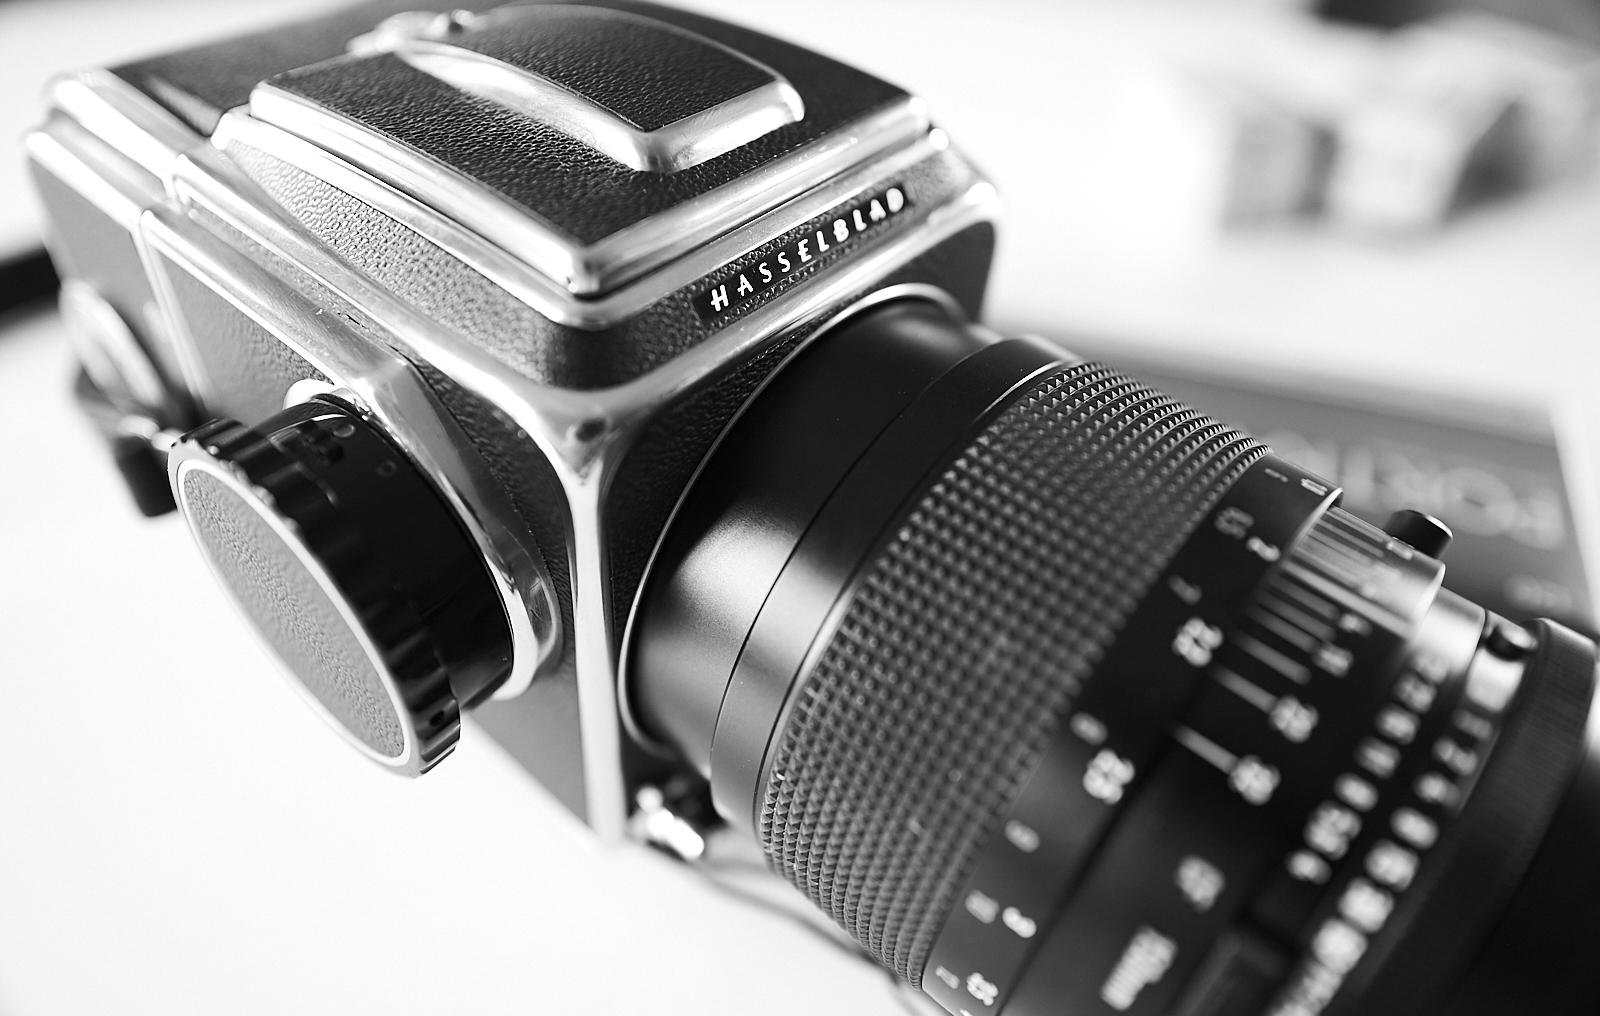 Hasselblad 500c medium format camera 150 Zeiss lens black and white film 120 mm